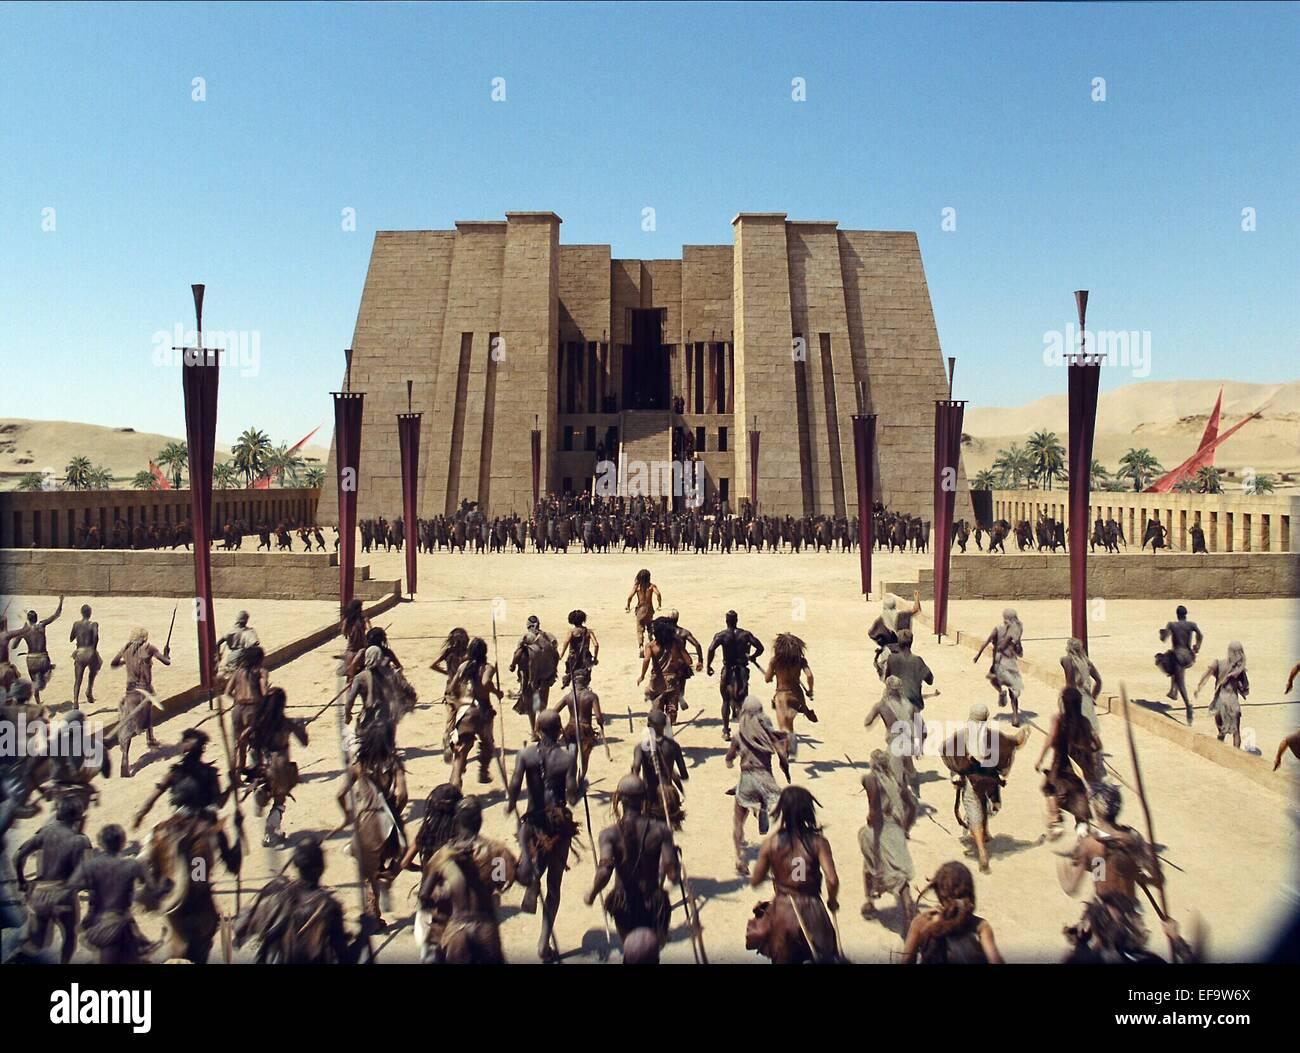 CROWD SCENE 10 000 BC (2008) - Stock Image